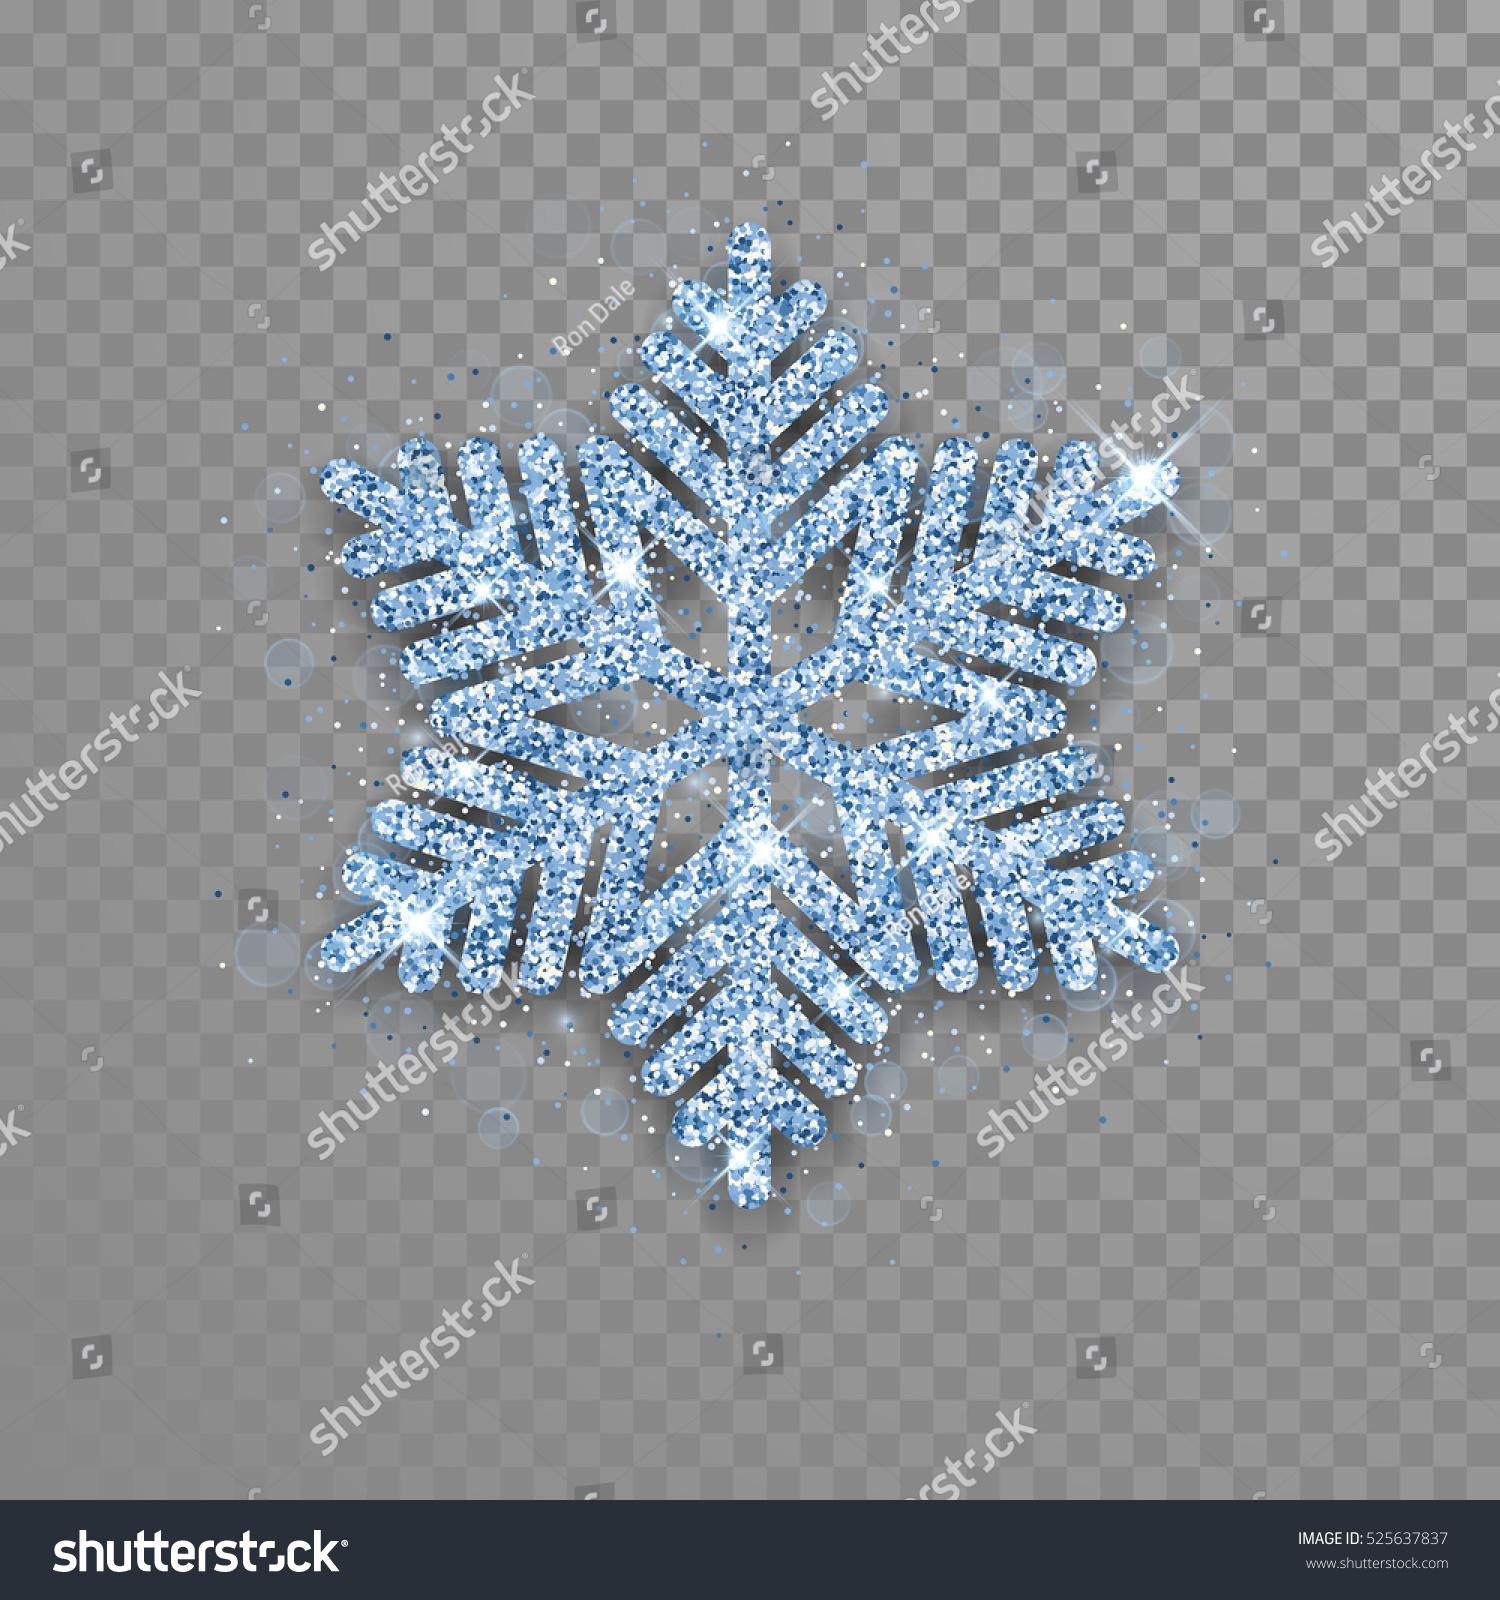 Ice Cream Background Sparking Shiny Decoration Free Vector: Snowflake Diamond Glitter Texture Christmas New Stock